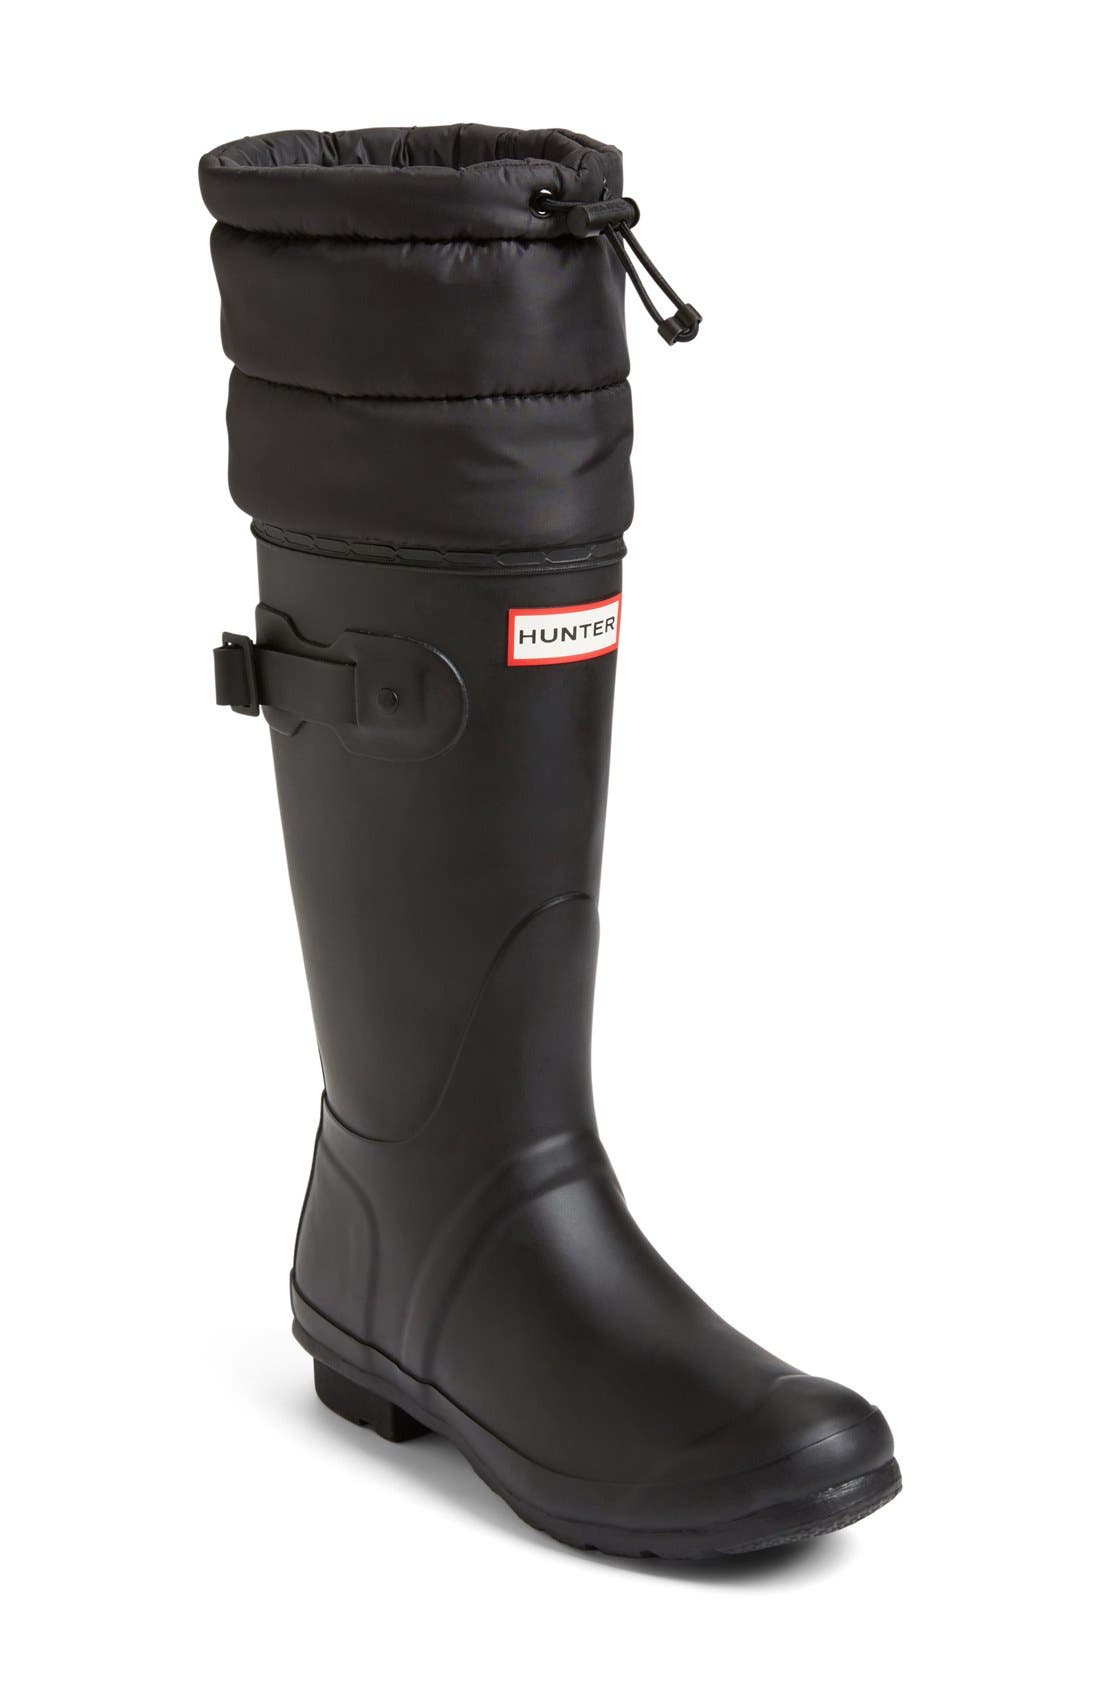 Main Image - Hunter 'Original - Quilted Cuff' Rain Boot (Women)